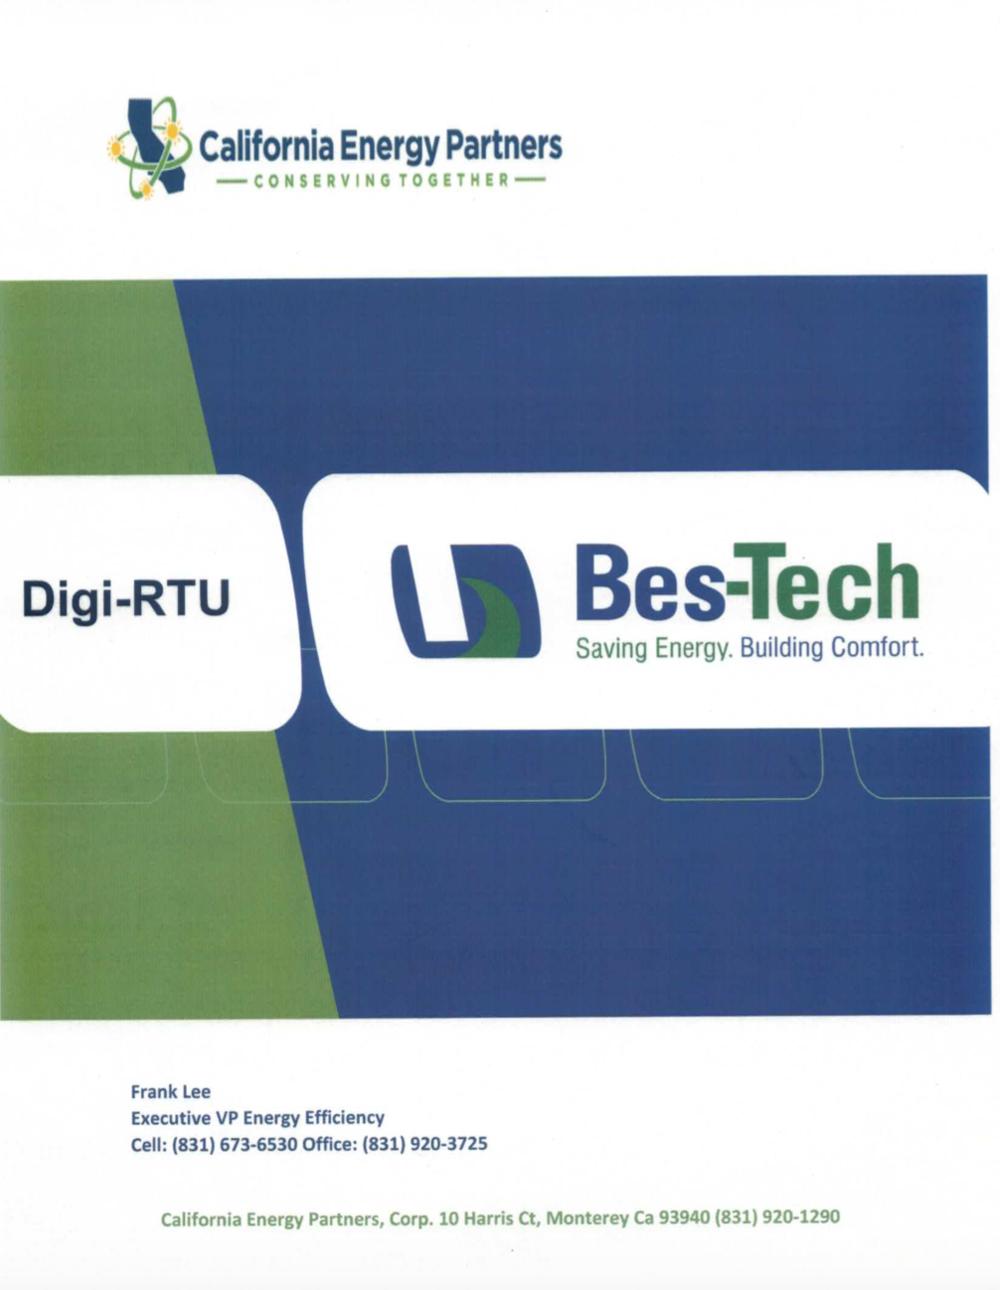 digi-RTU.png